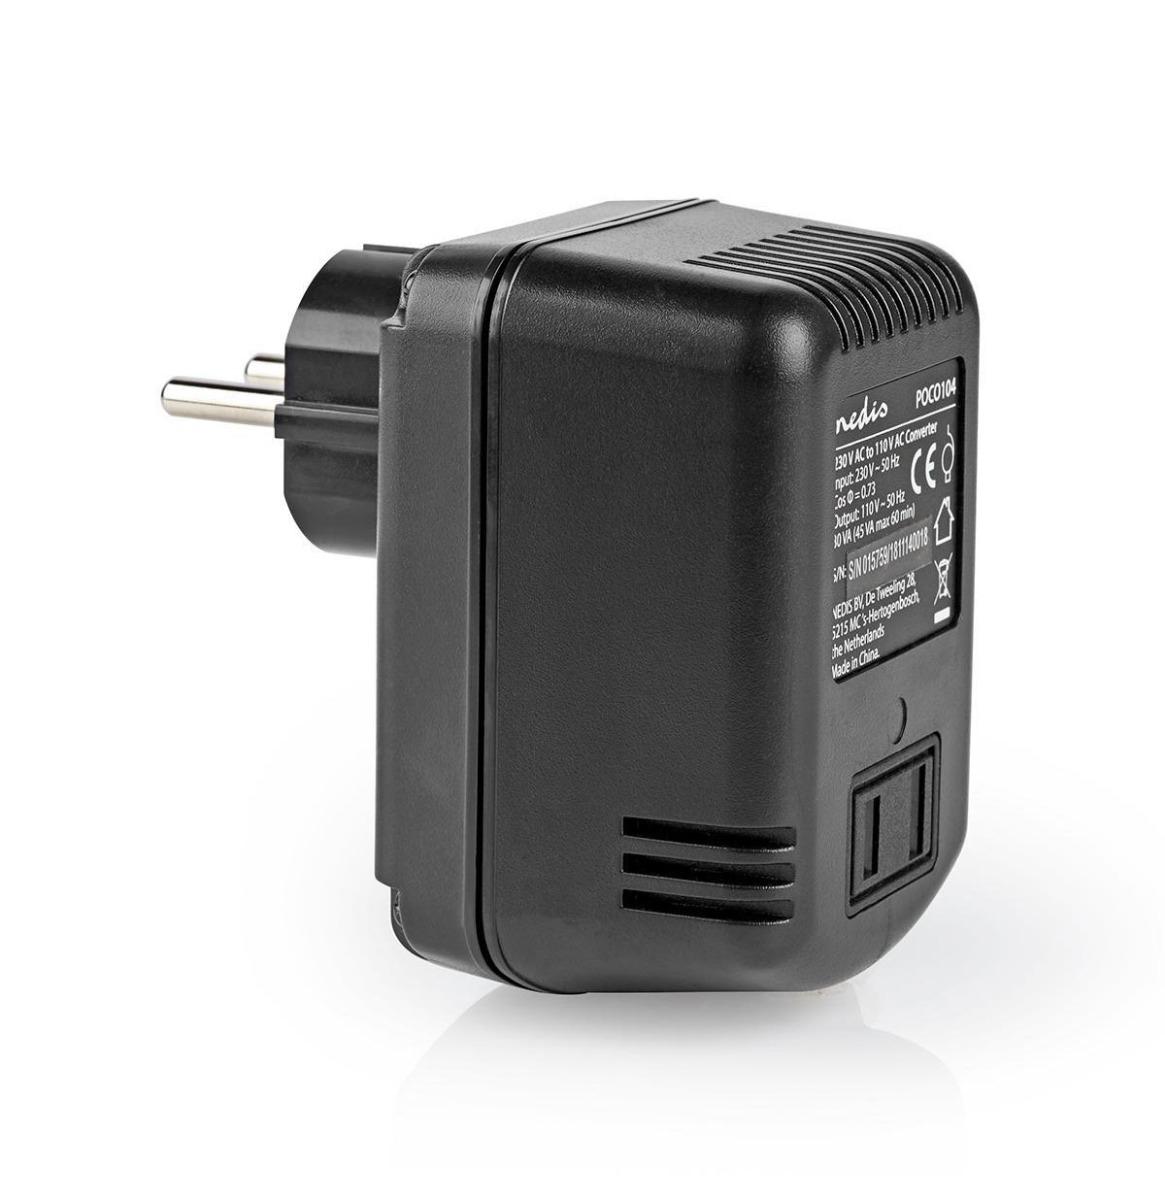 Power Converter - 230 VAC 50 Hz - 45 Watt